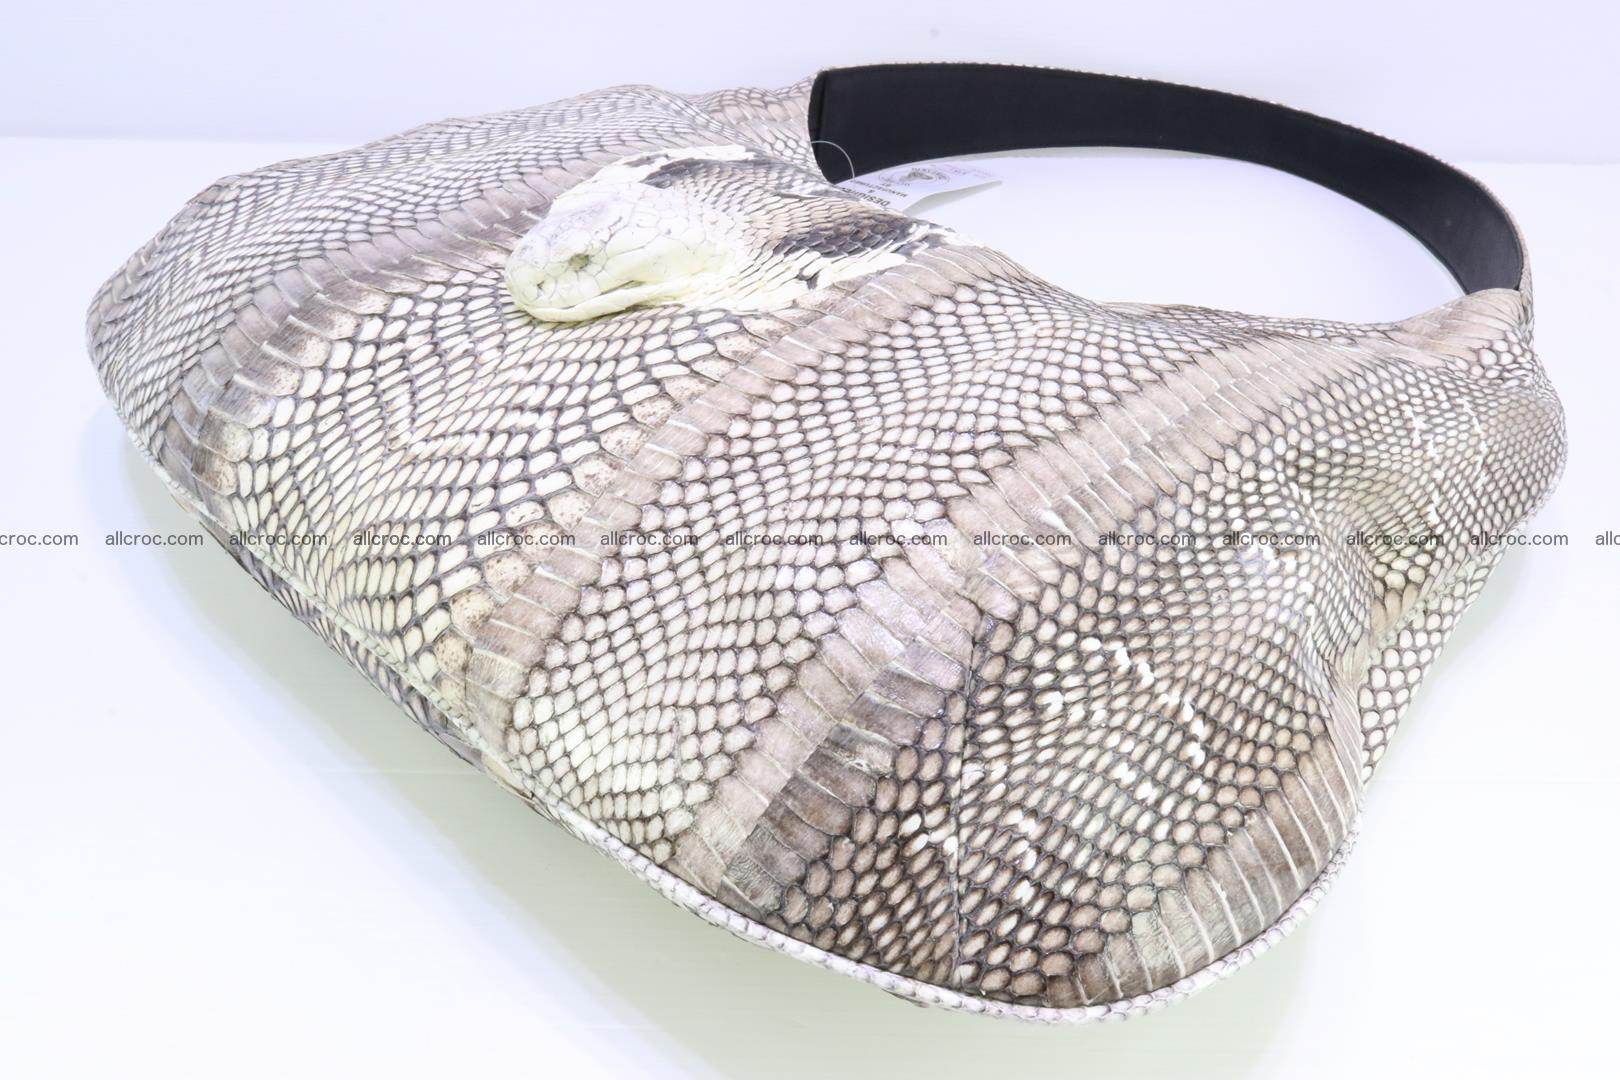 Cobra skin ladies handbag with head of cobra 194 Foto 13